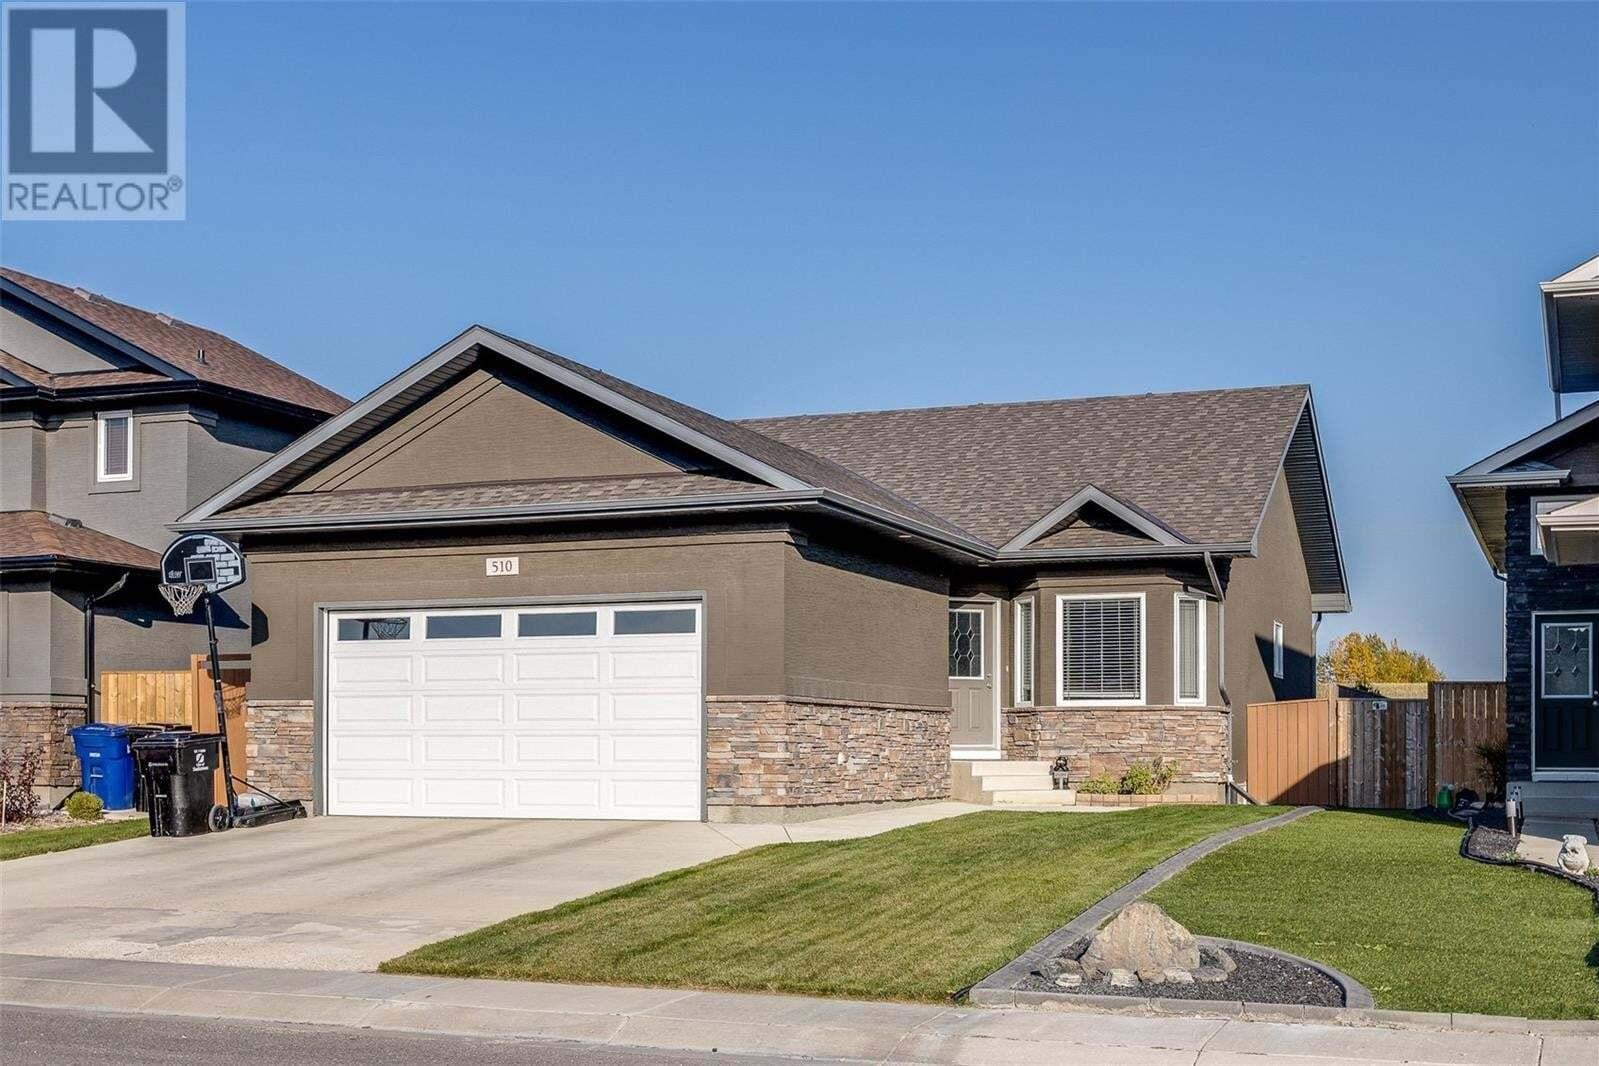 House for sale at 510 Senick Cres Saskatoon Saskatchewan - MLS: SK827807